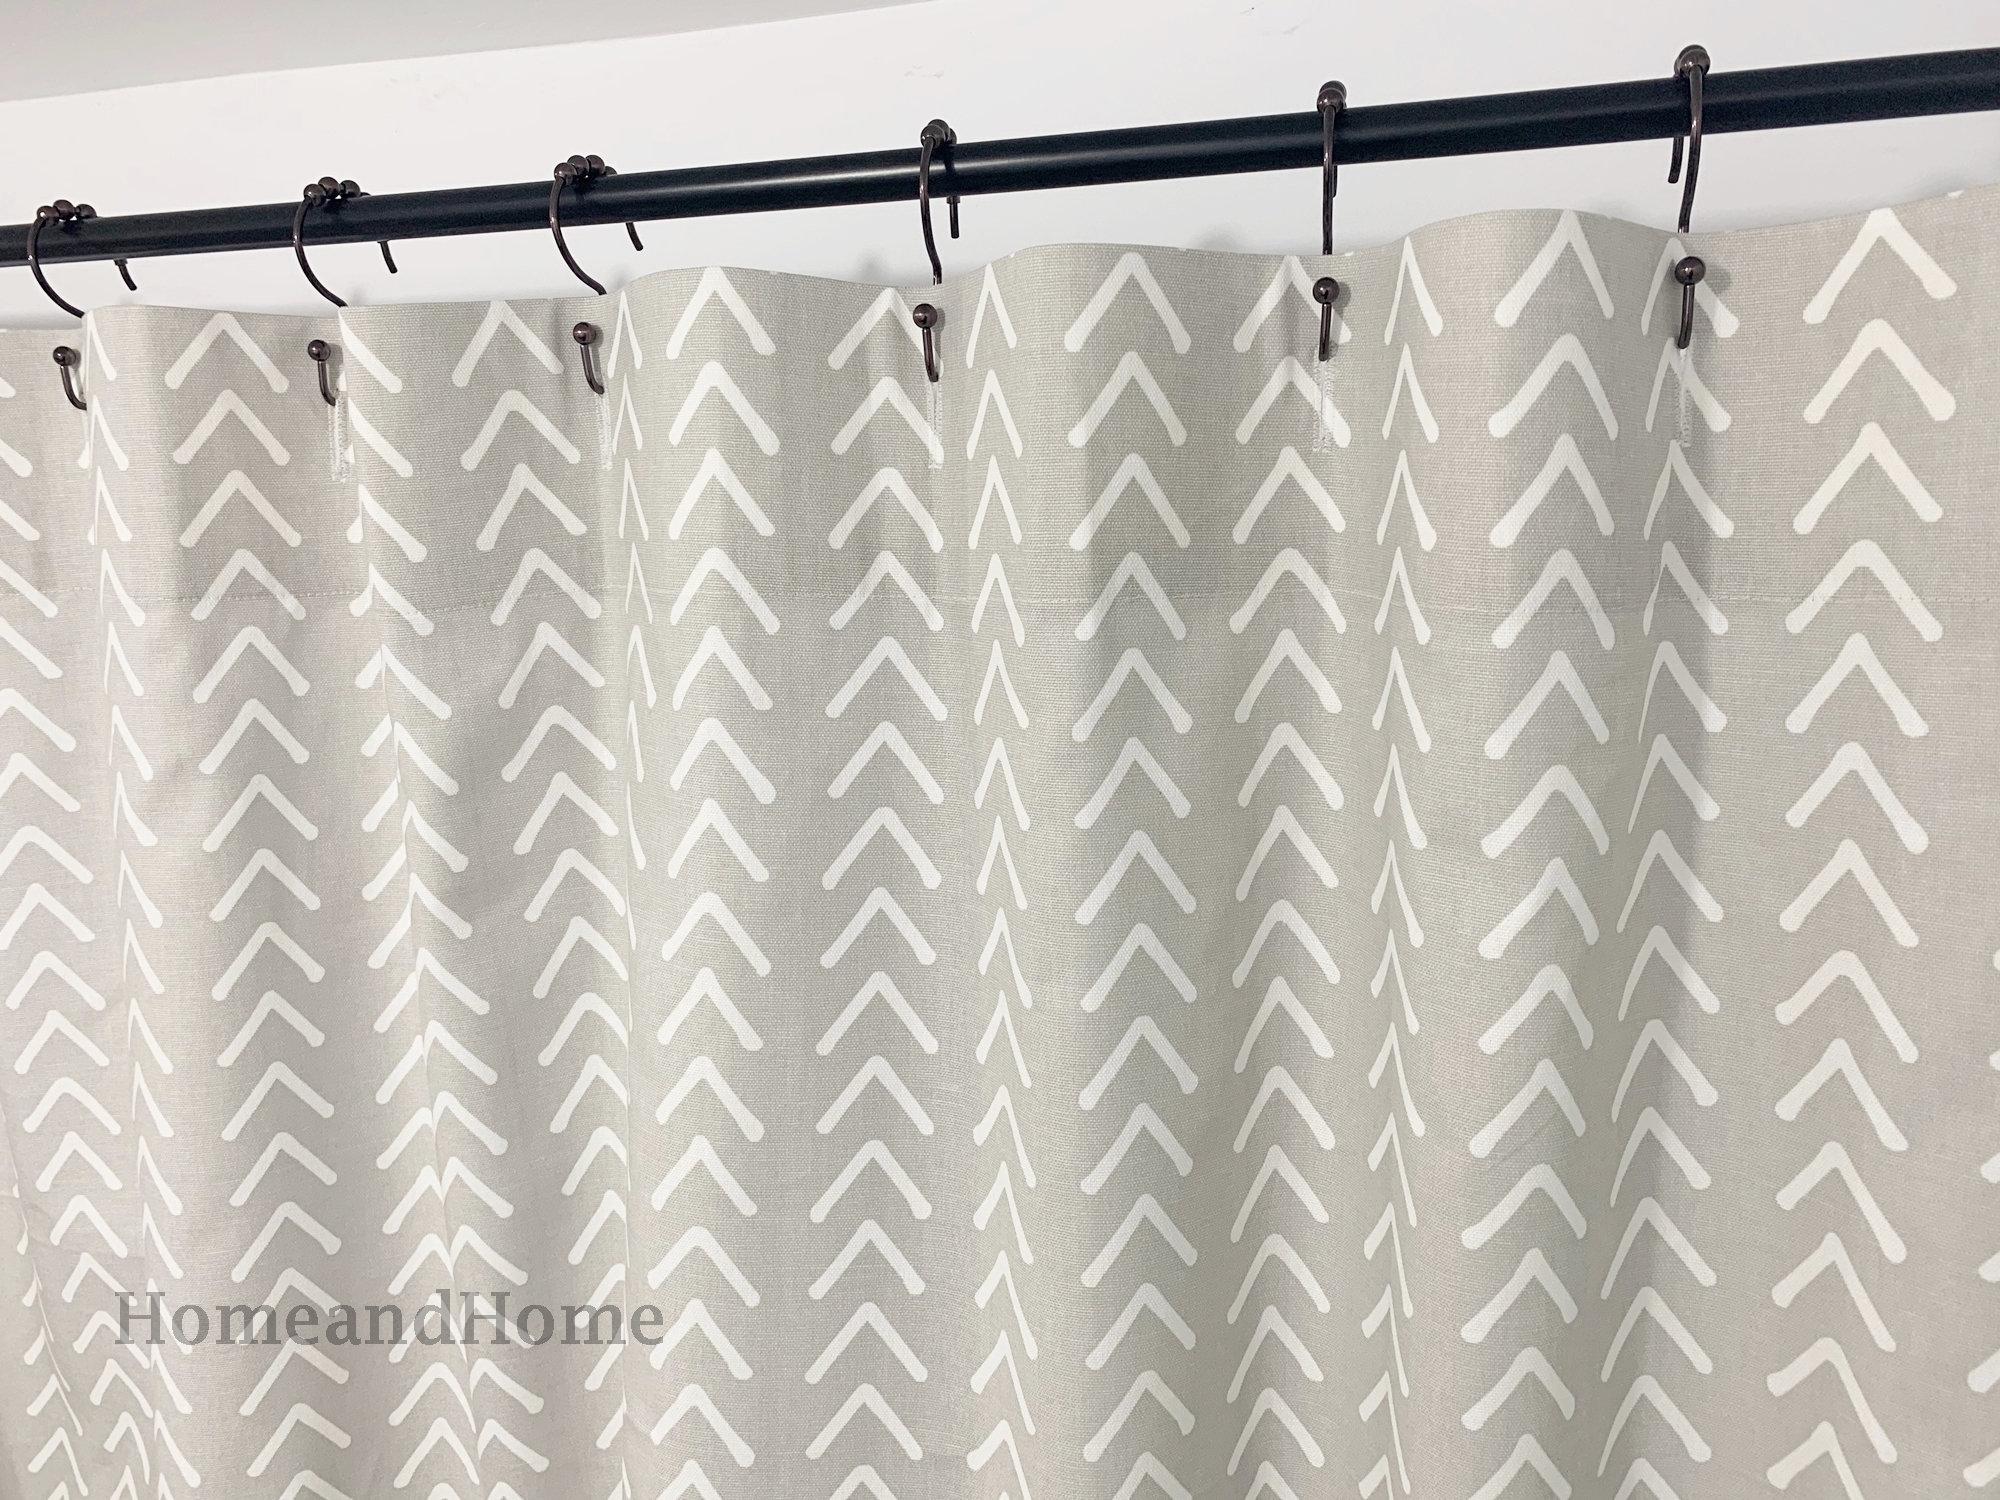 French Gray Shower Curtain Boho Gray White 72x 84 108 Fabric Shower Curtain Long Shower Curtain Extra Wide Shower Curtain 72 X 96 72 X84